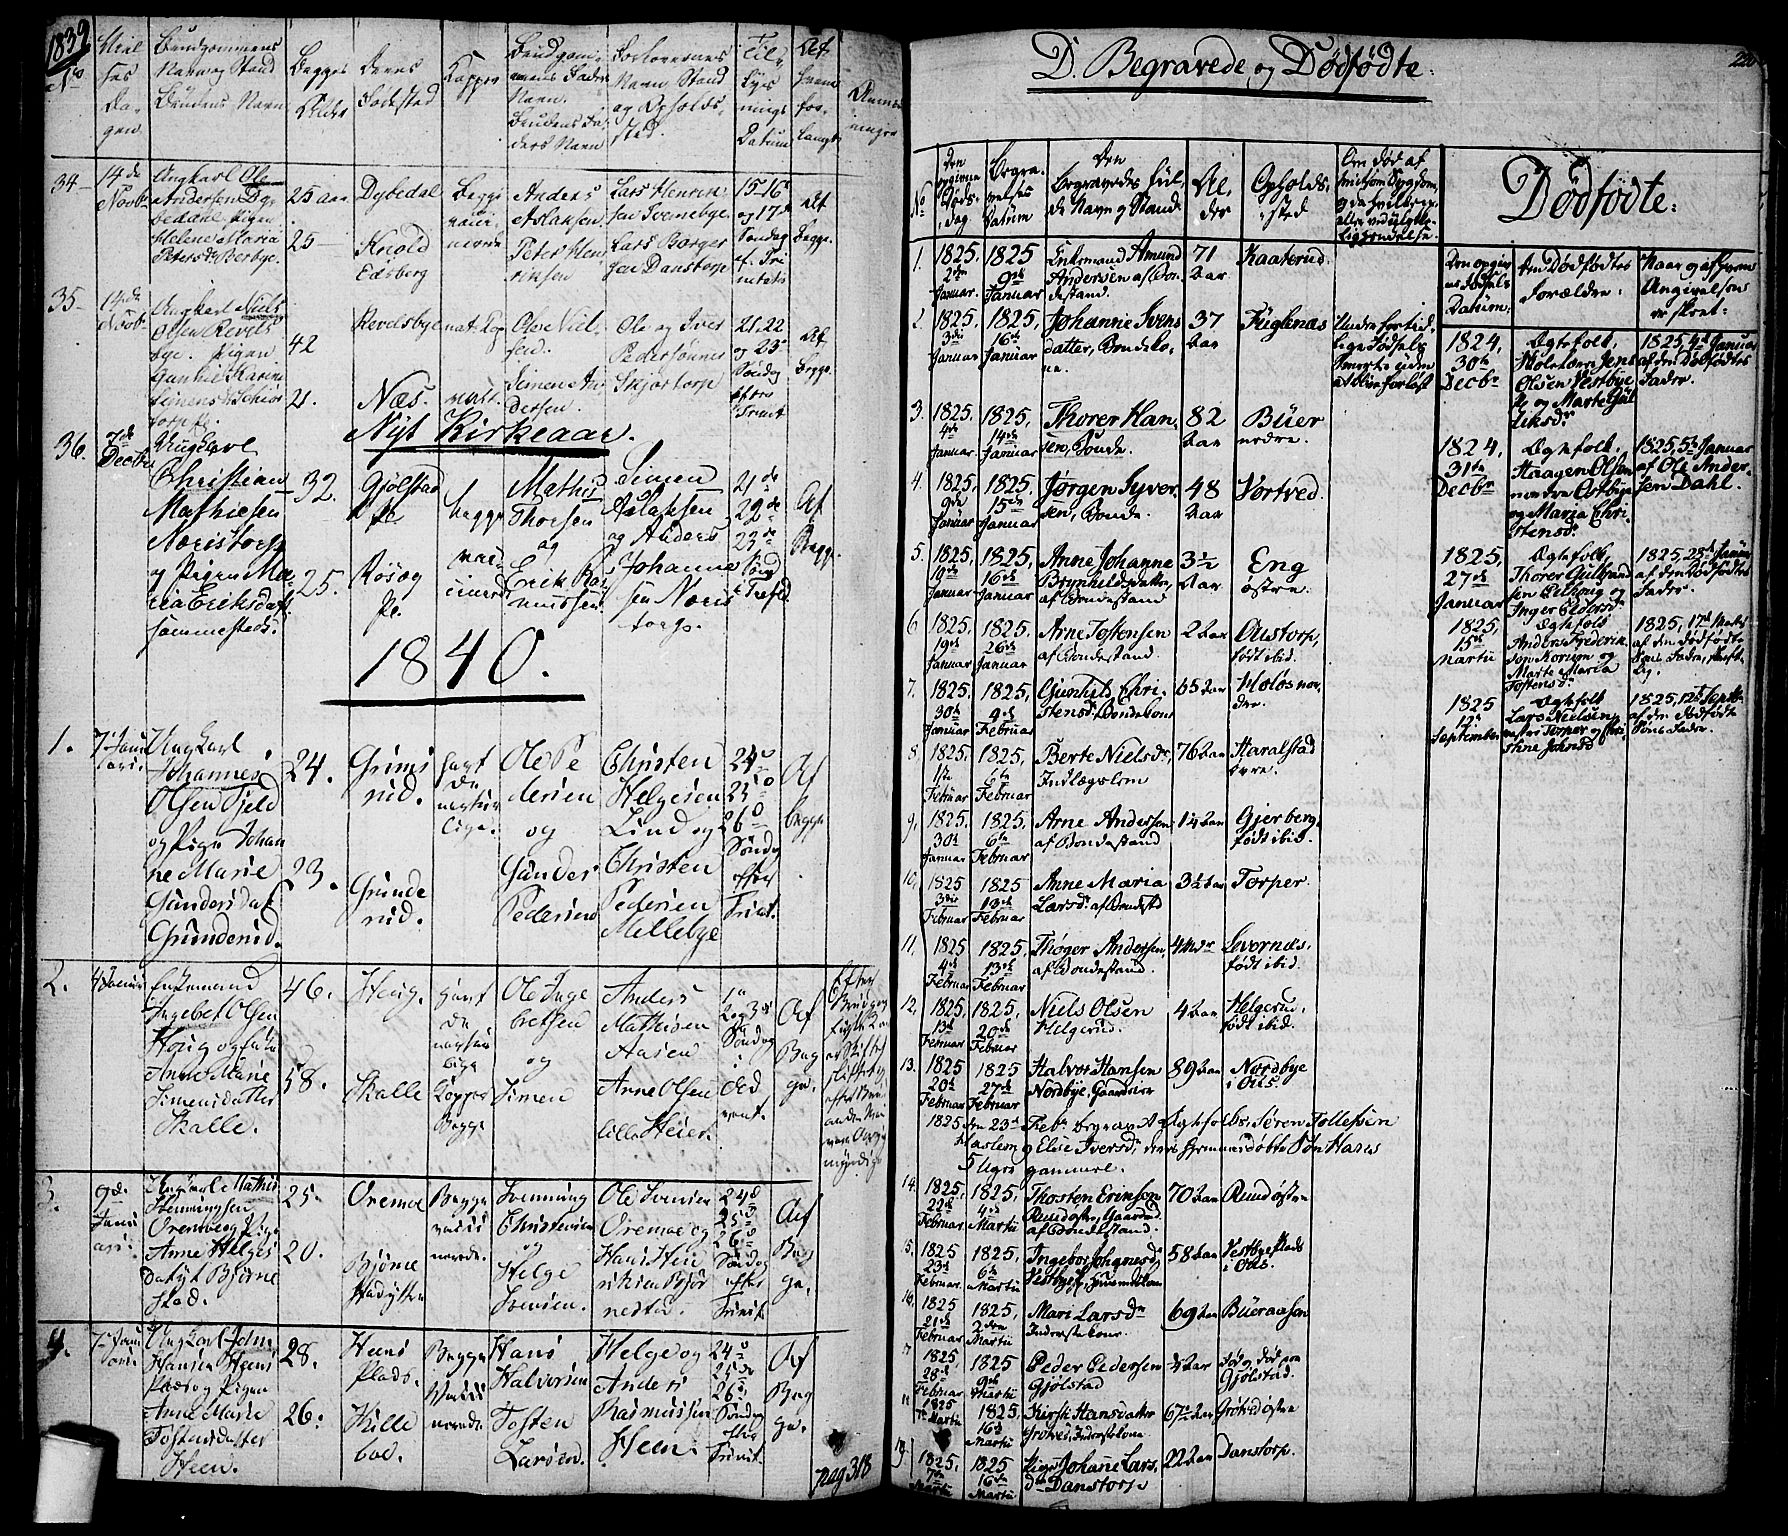 SAO, Rakkestad prestekontor Kirkebøker, F/Fa/L0007: Ministerialbok nr. I 7, 1825-1841, s. 220